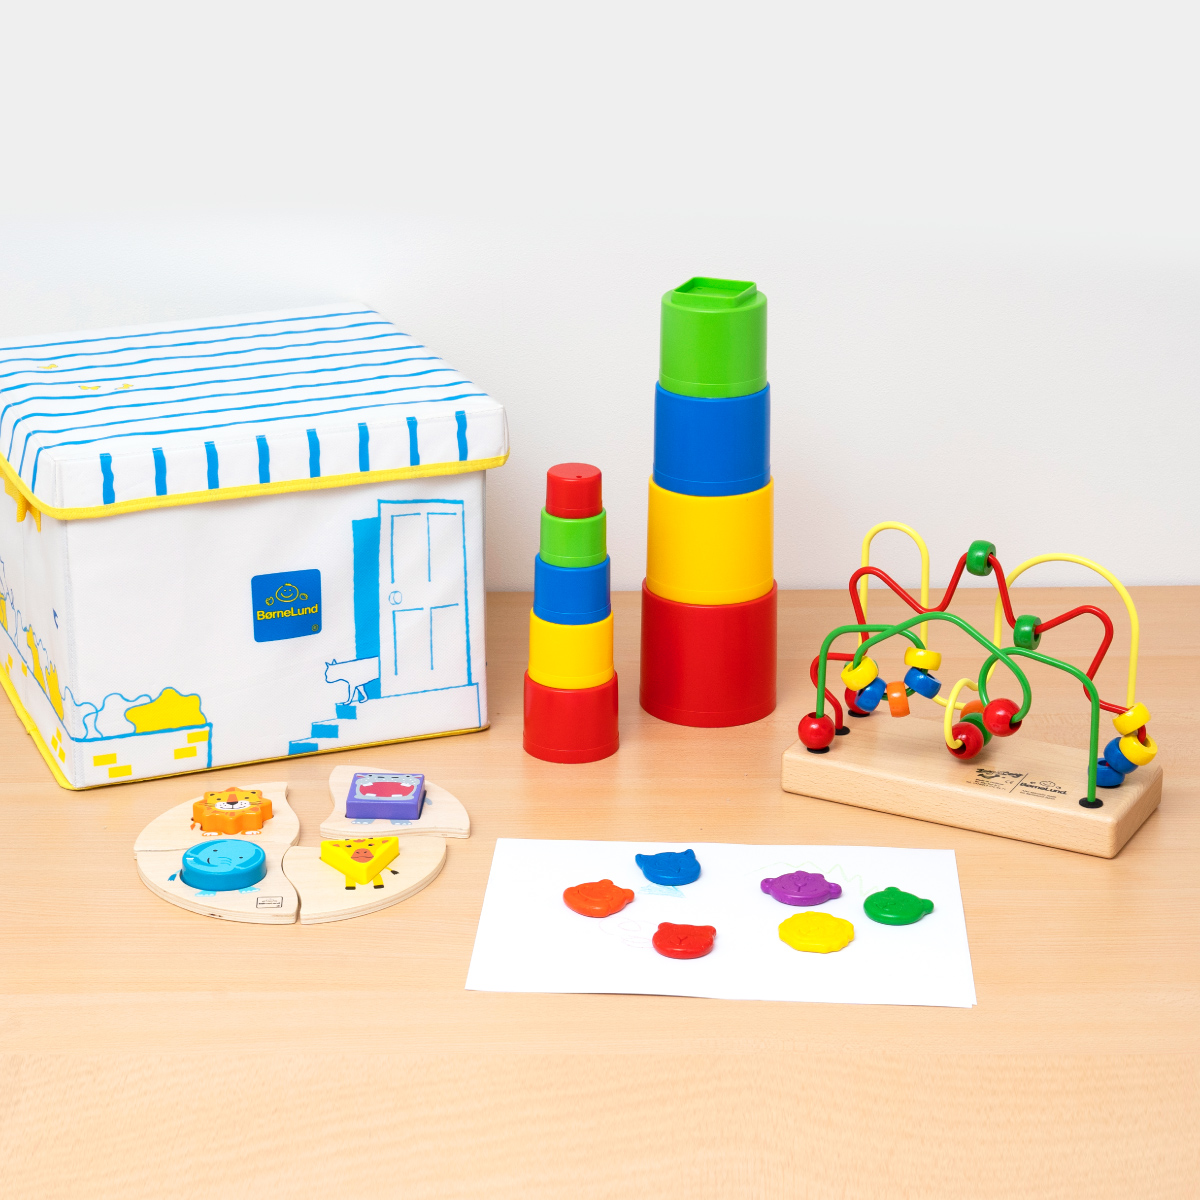 【20%OFF】1歳からの知育遊びセット【お片付けできる収納ボックス付き】